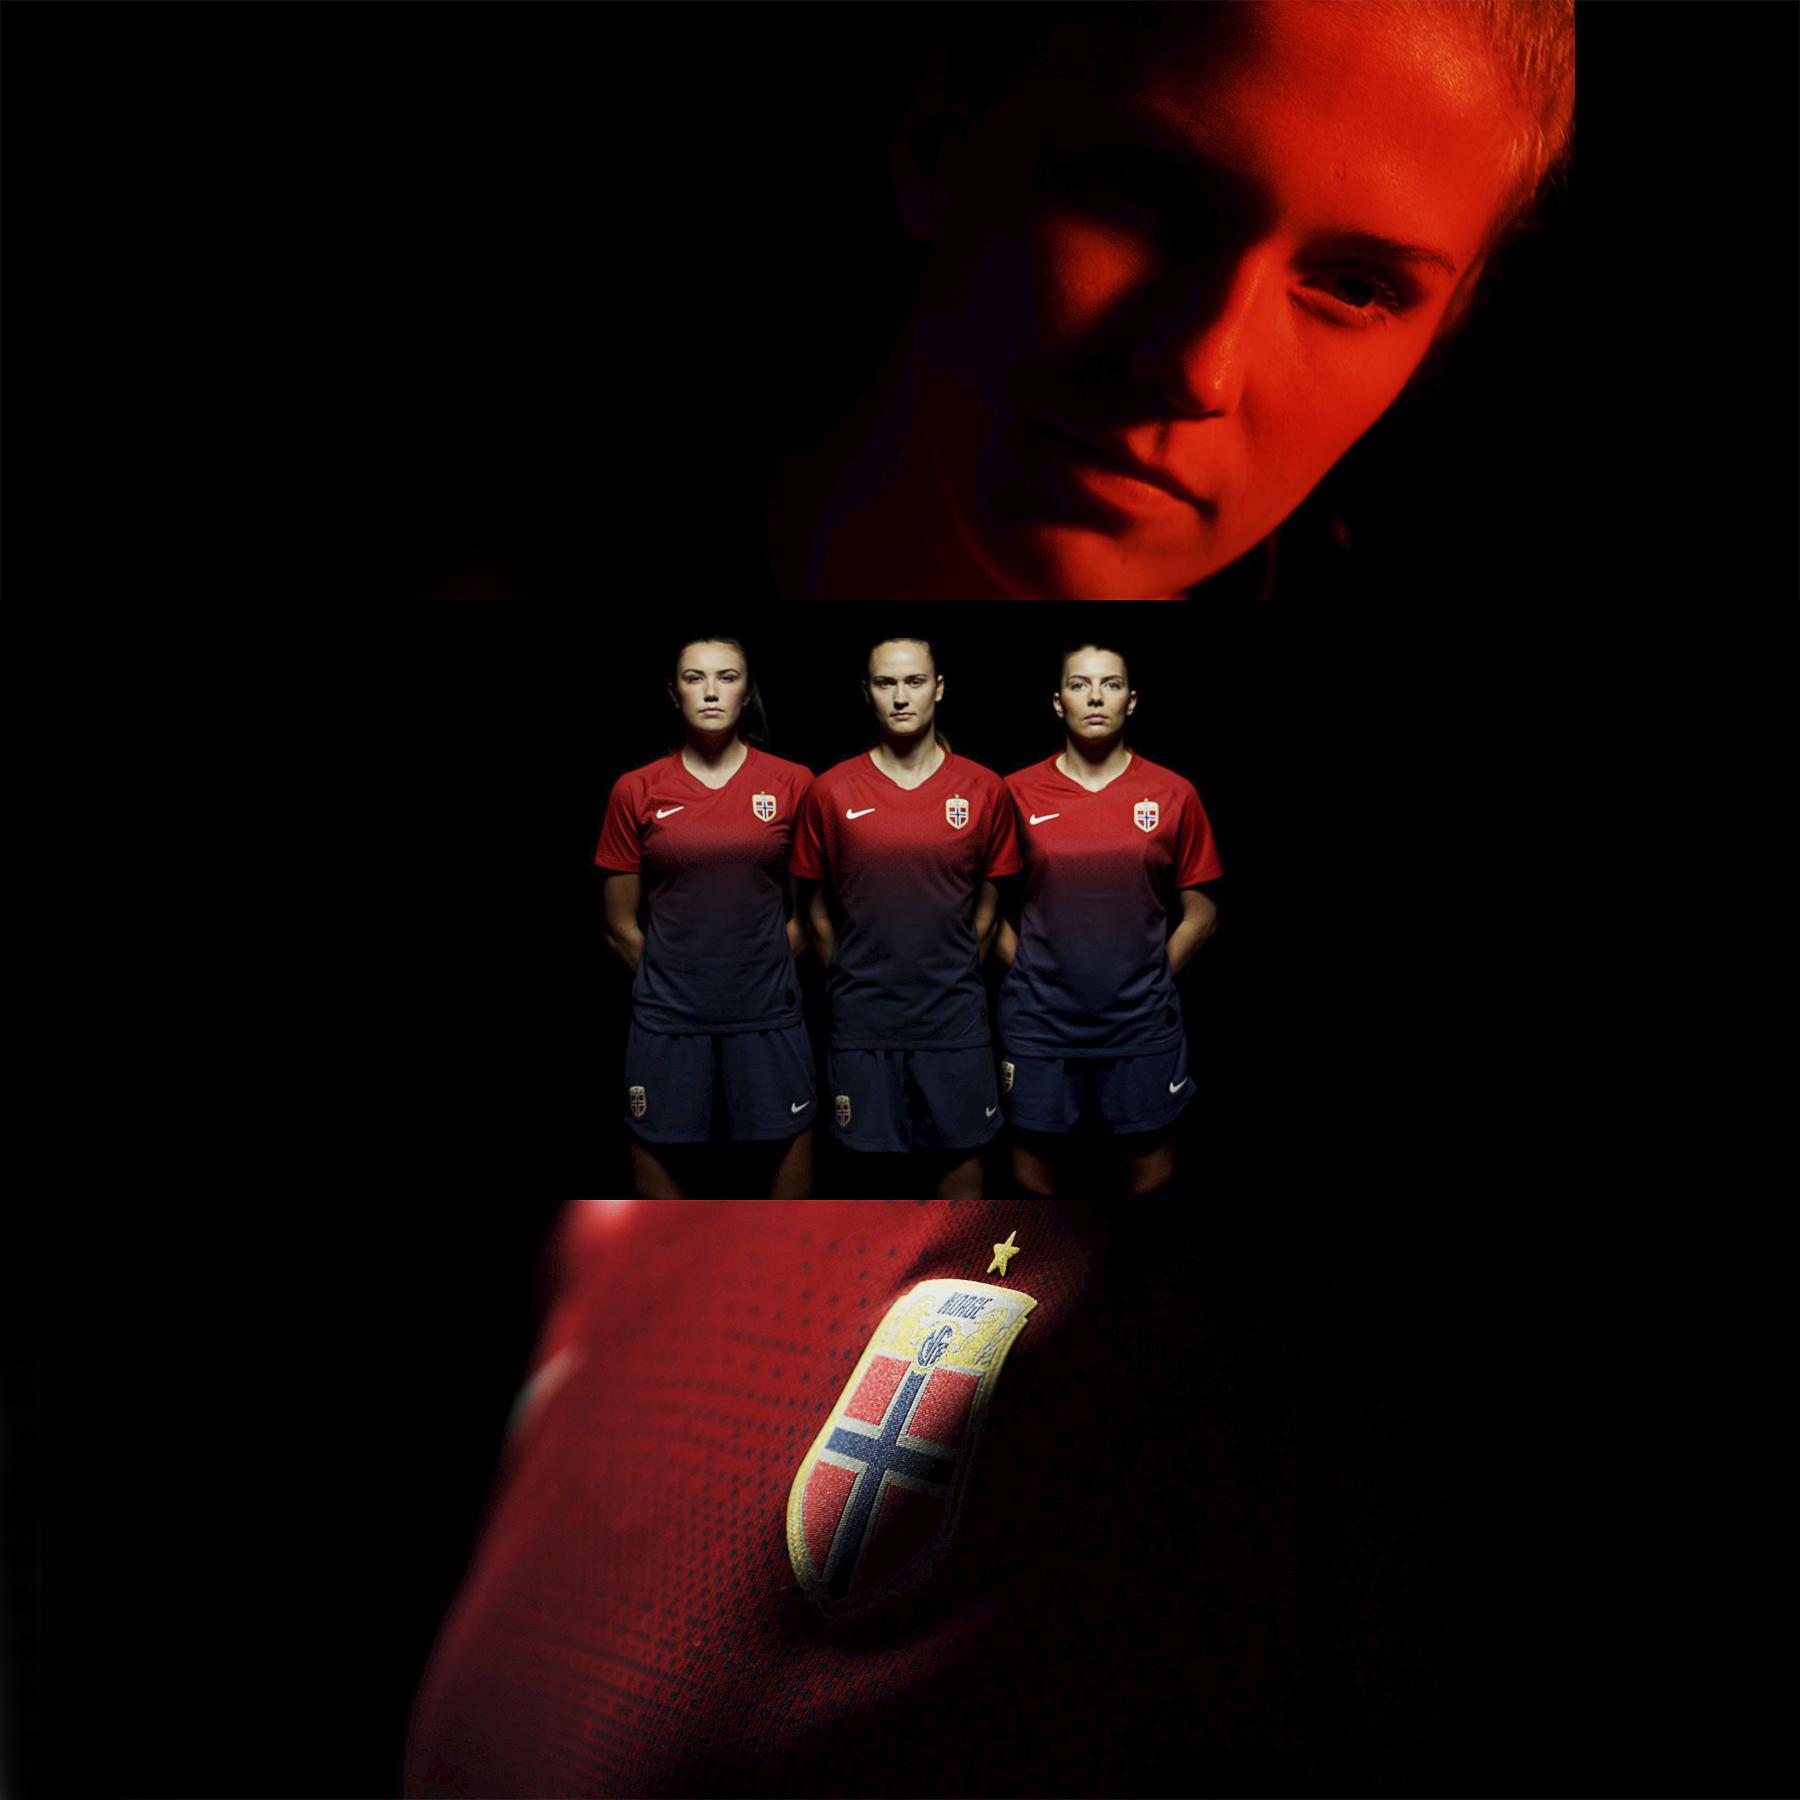 Nike_insta_01.jpg